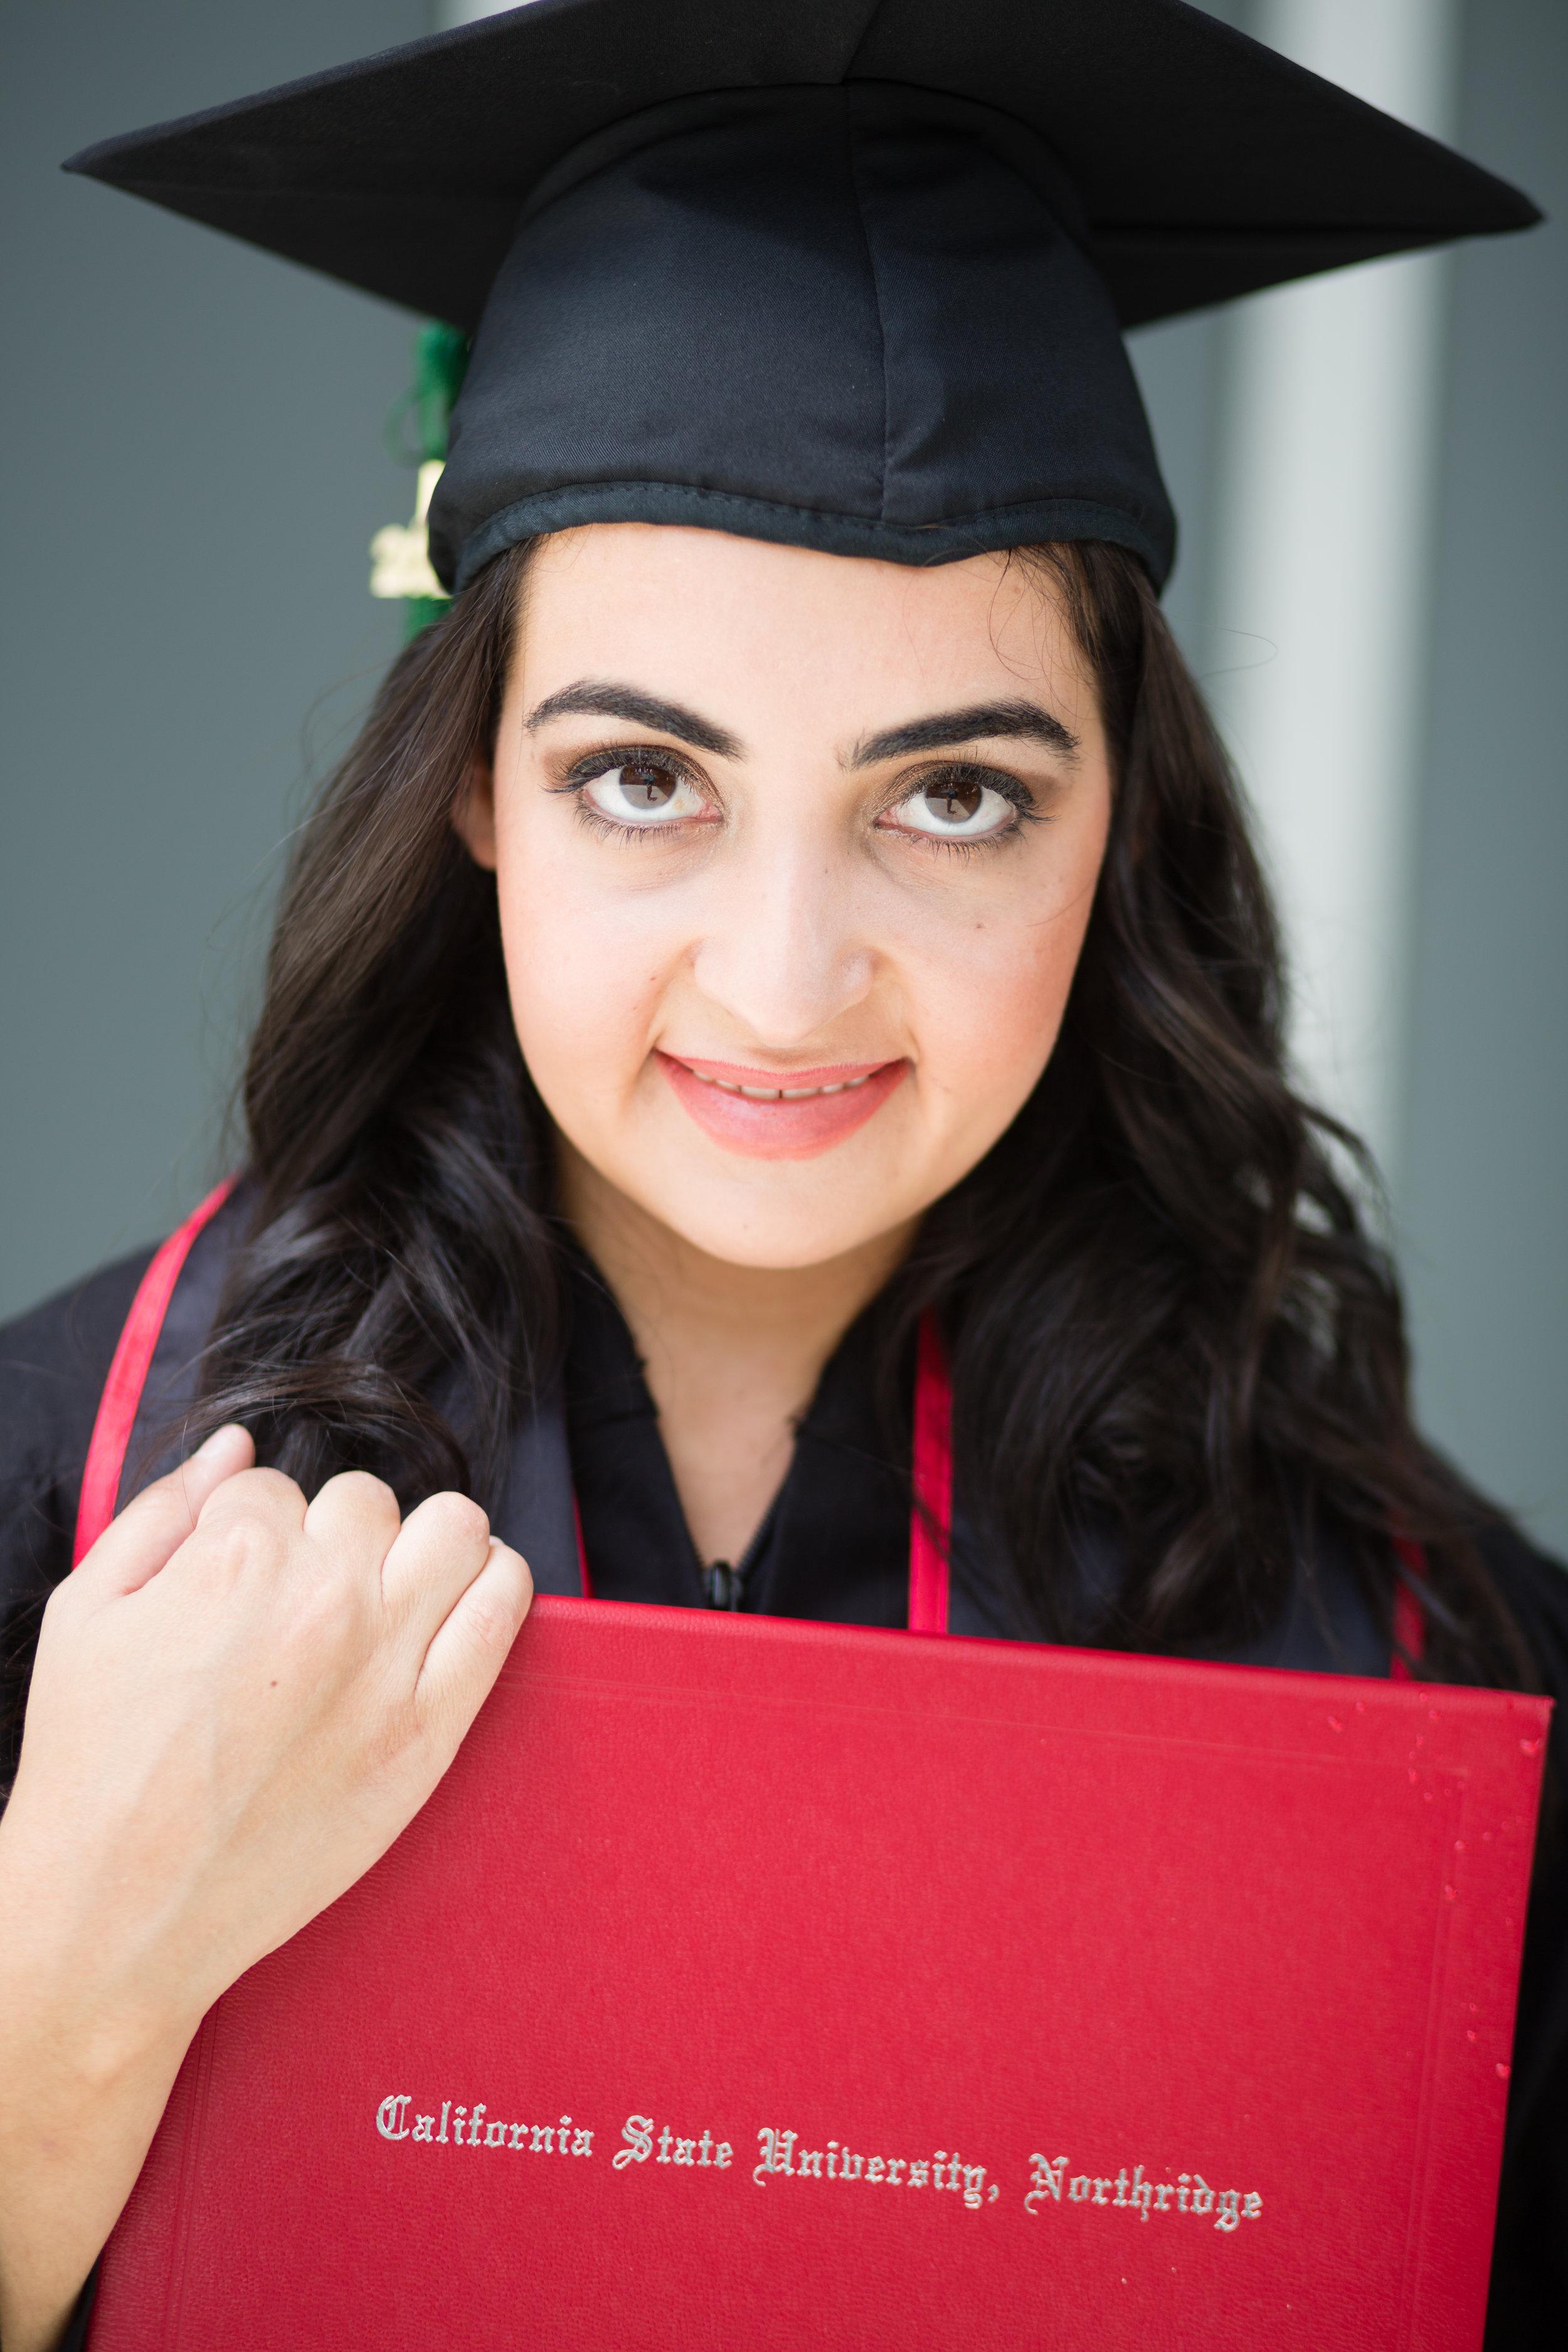 Graduation photograph